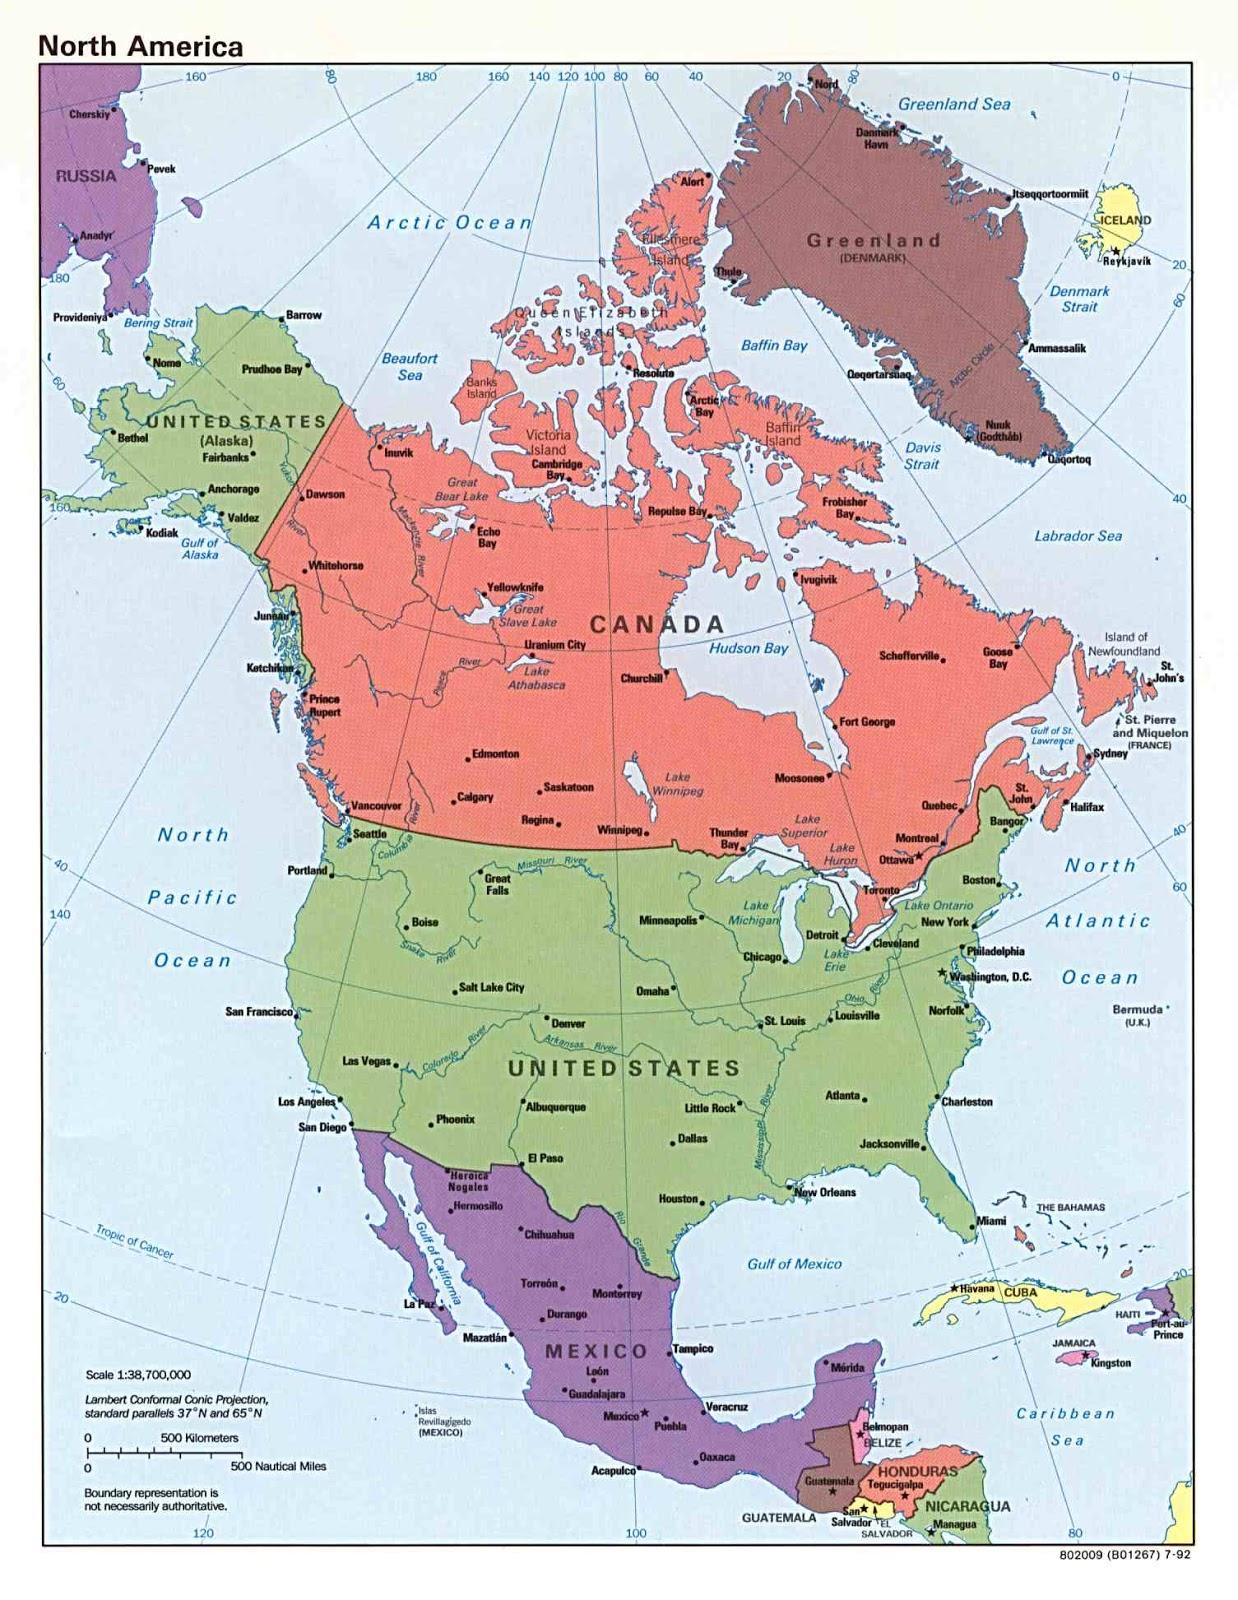 Travelersgram Continents Review North America